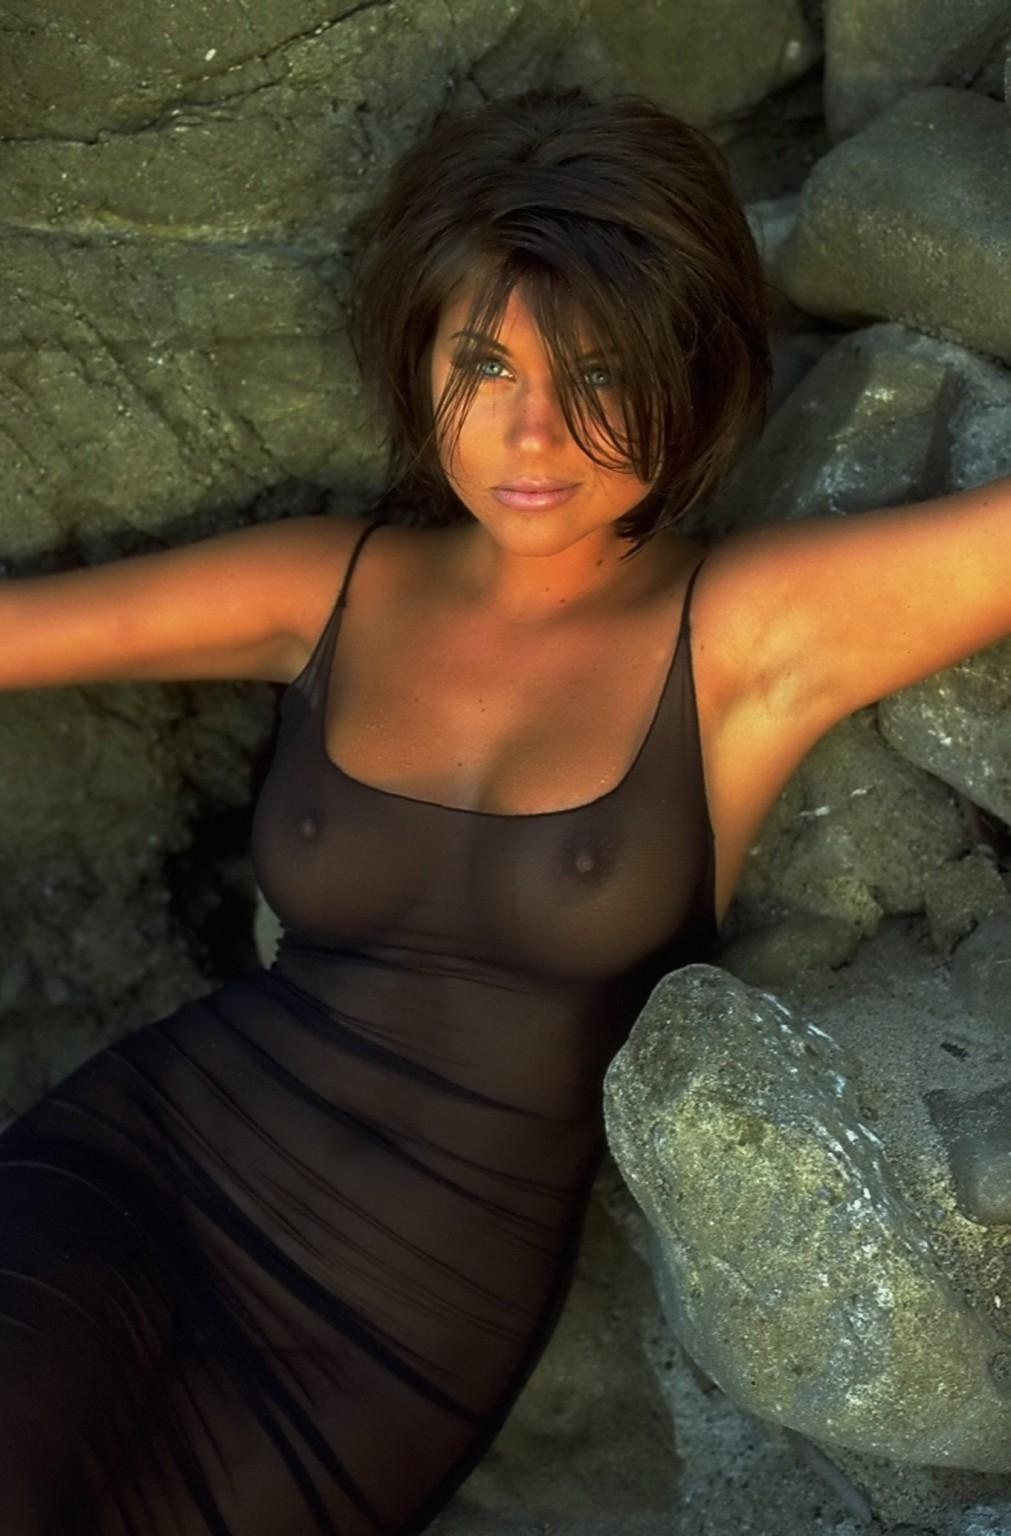 Hot nude female gifs